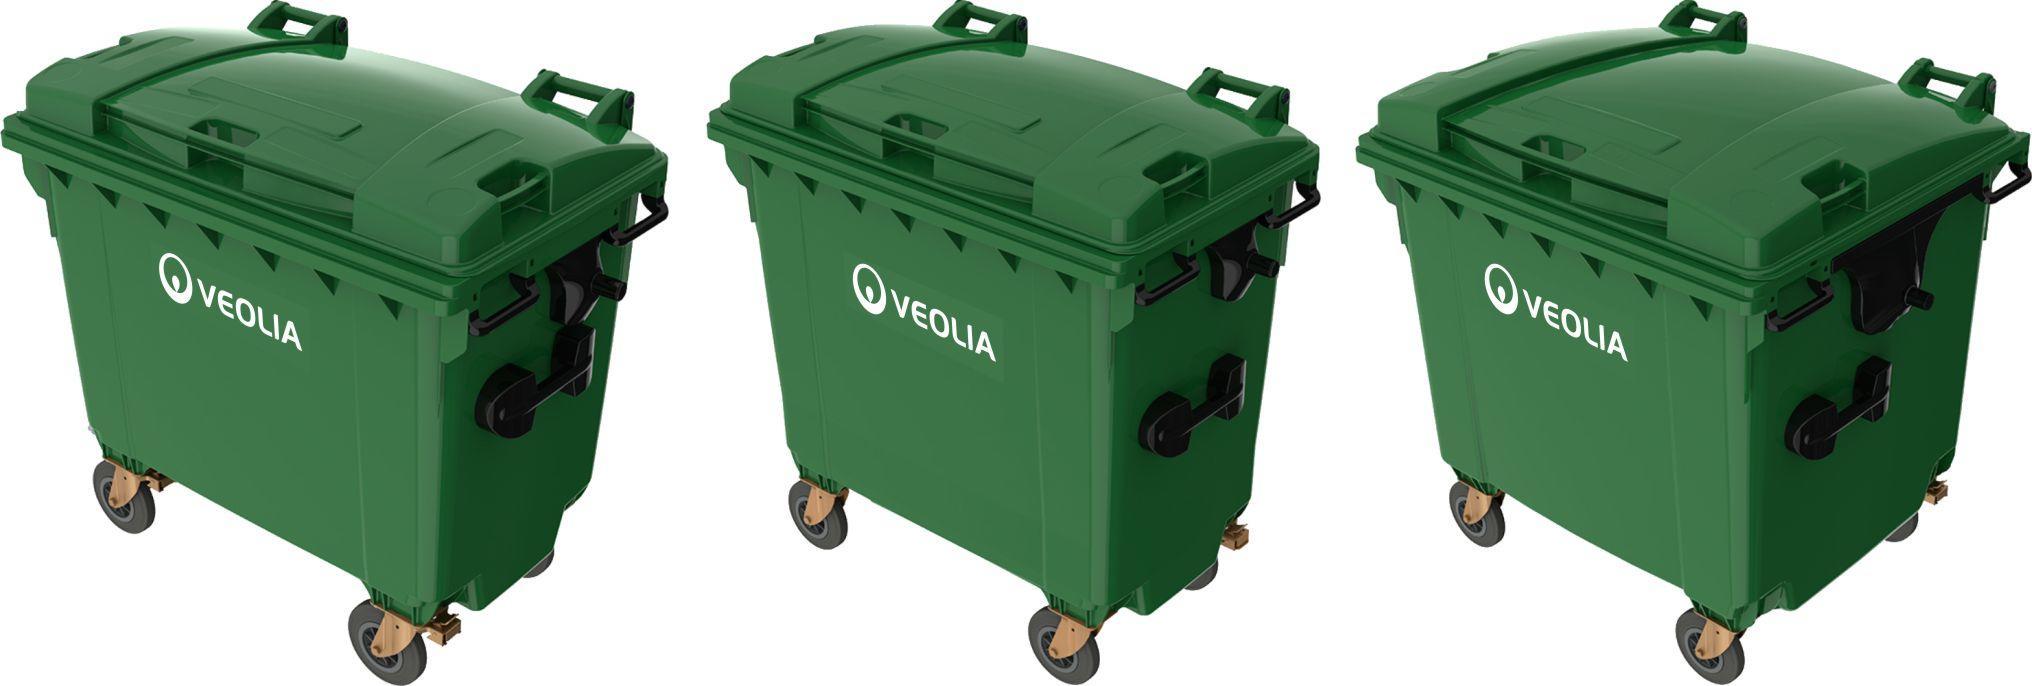 Veolia Container